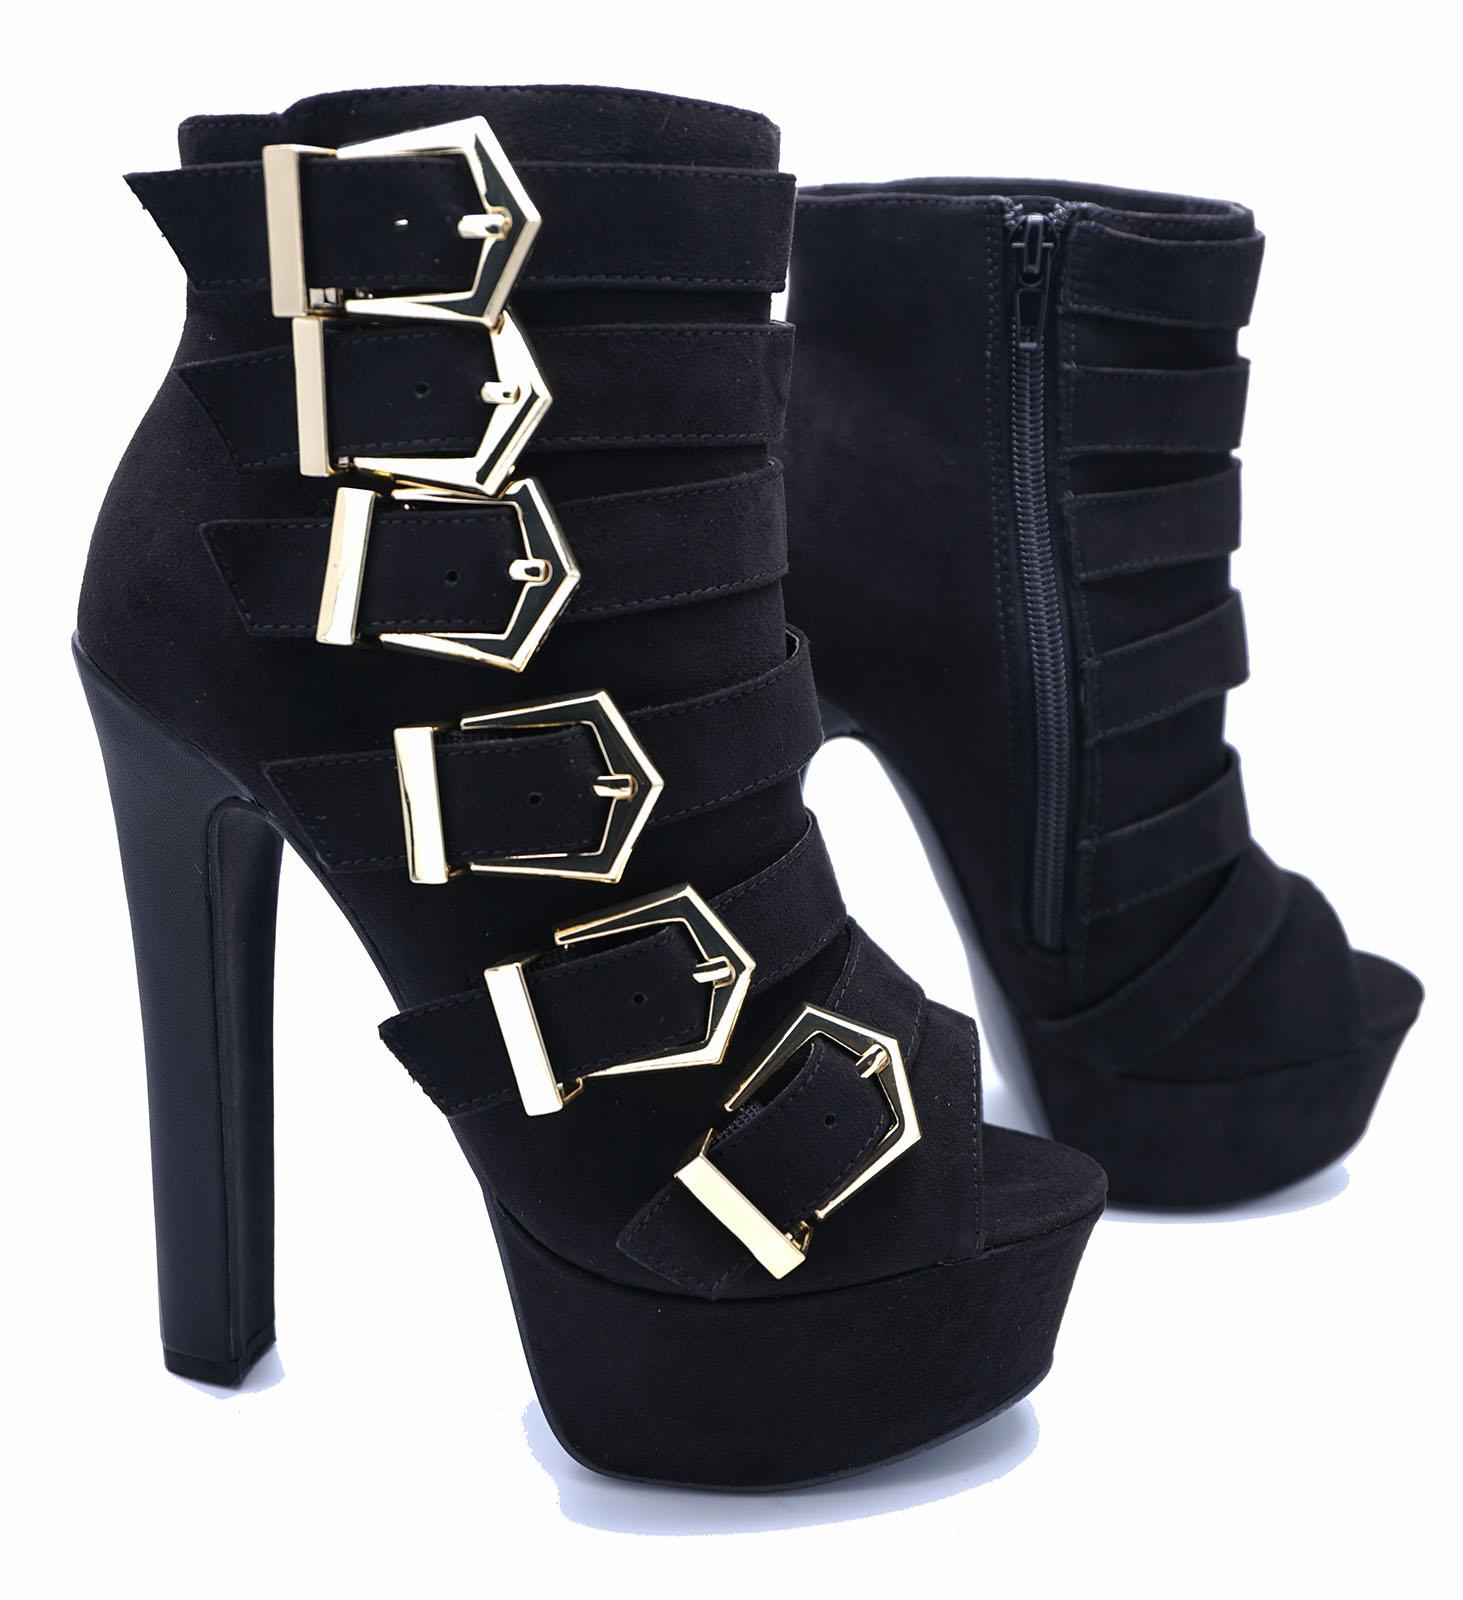 LADIES-BLACK-ZIP-UP-PLATFORM-PEEP-TOE-BUCKLE-ANKLE-CALF-HIGH-HEEL-BOOTS-SIZES-3 thumbnail 42